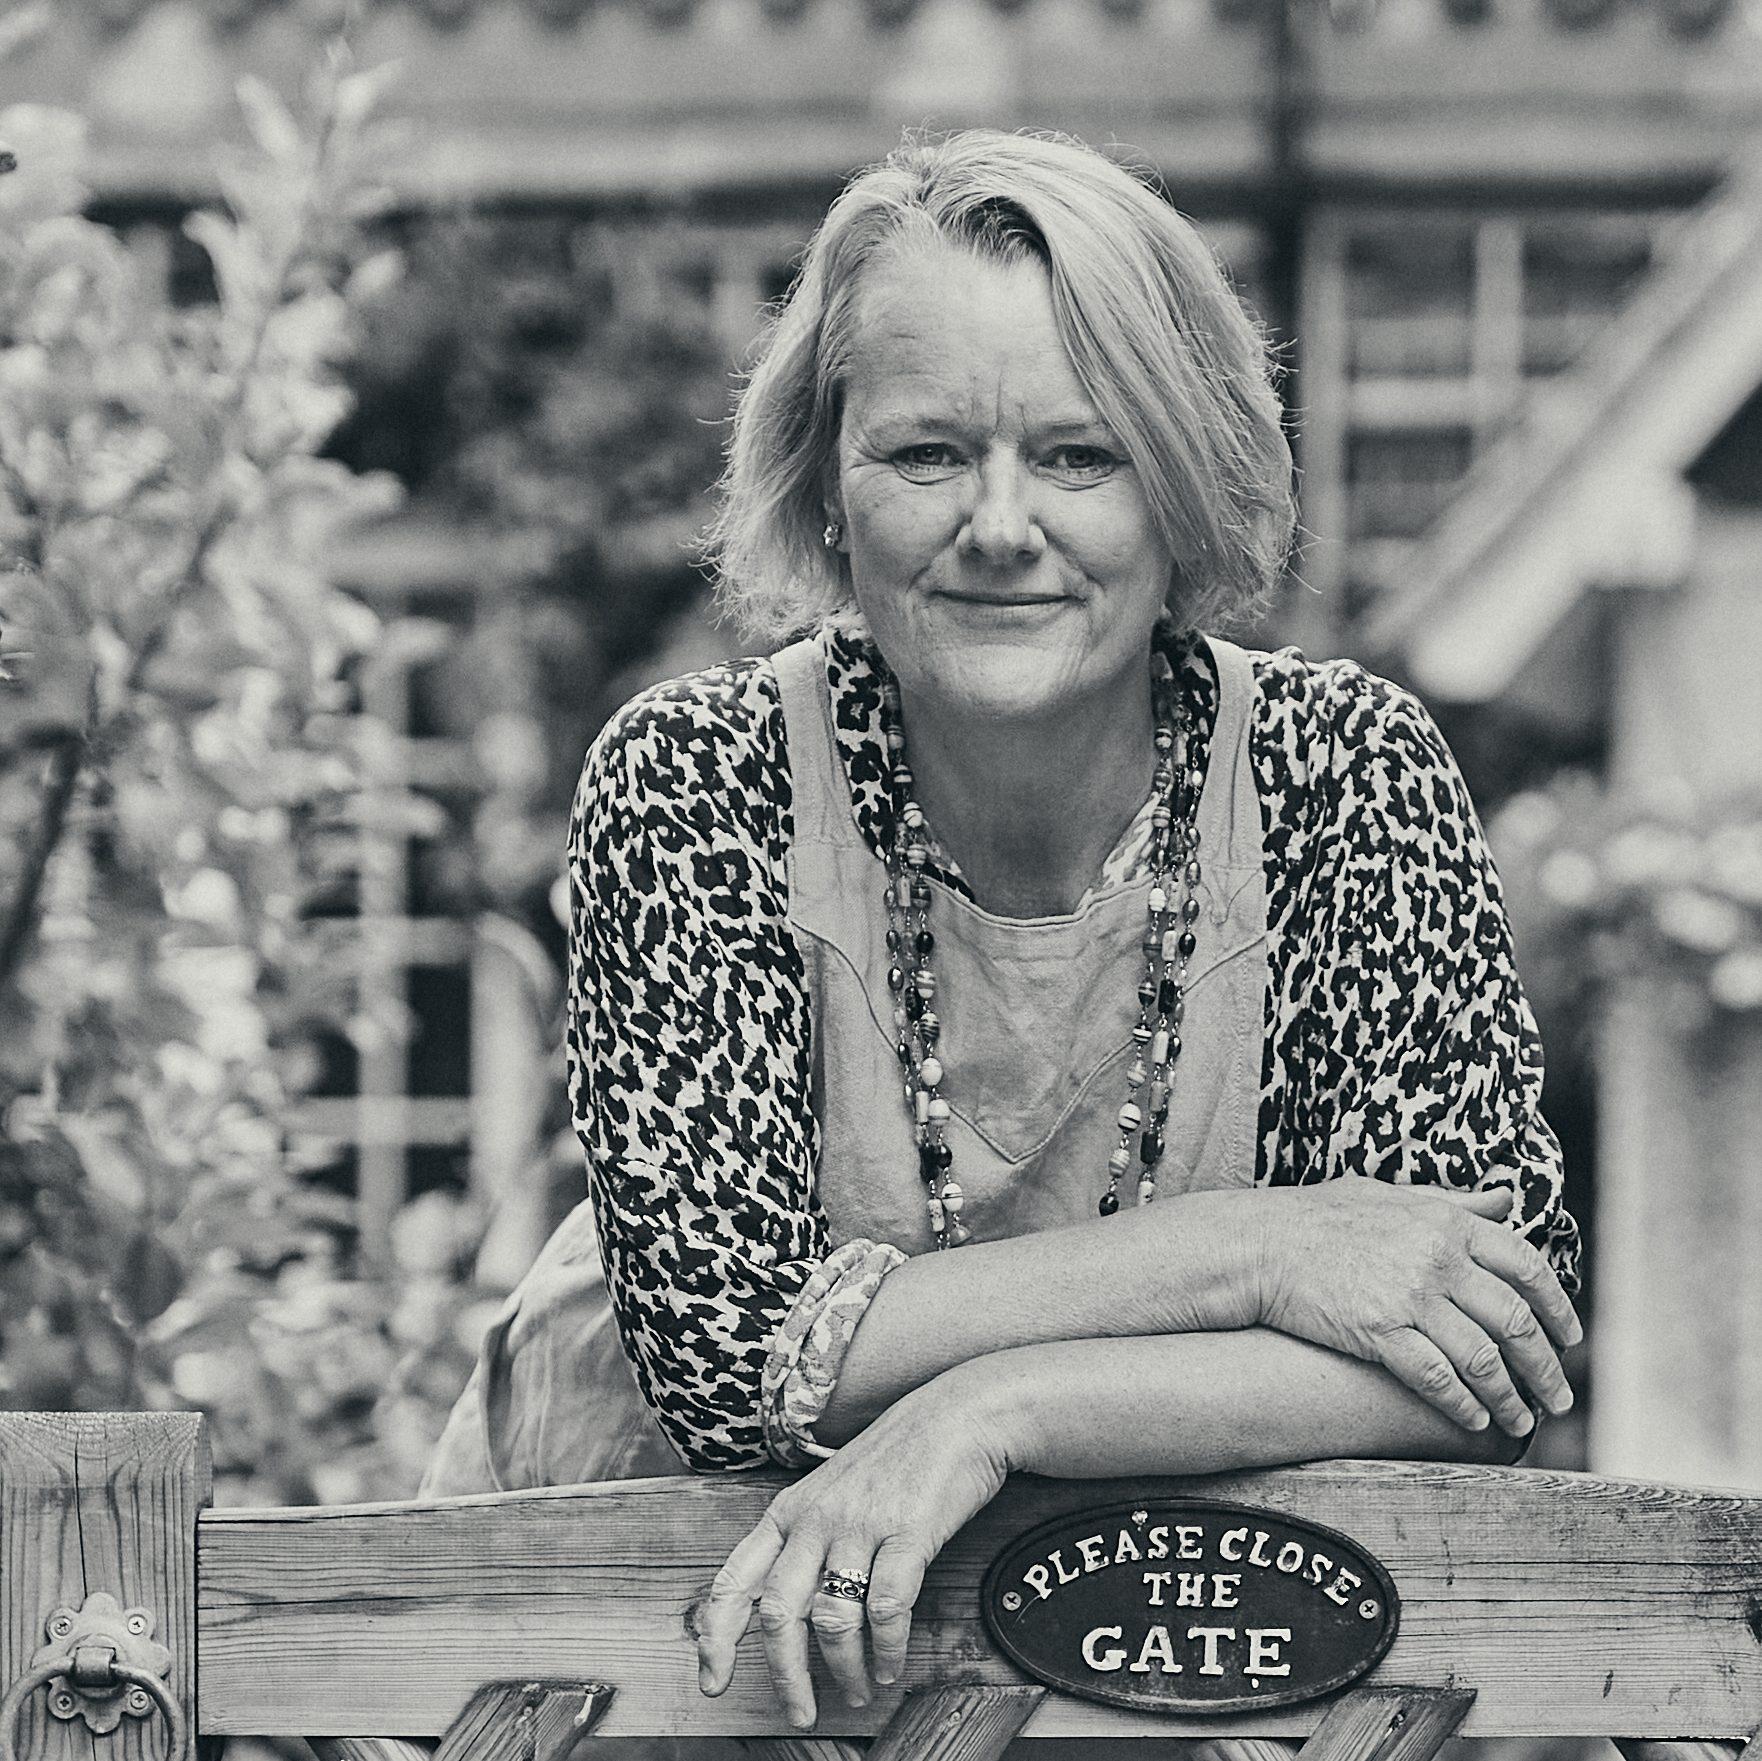 Ruth Macintyre